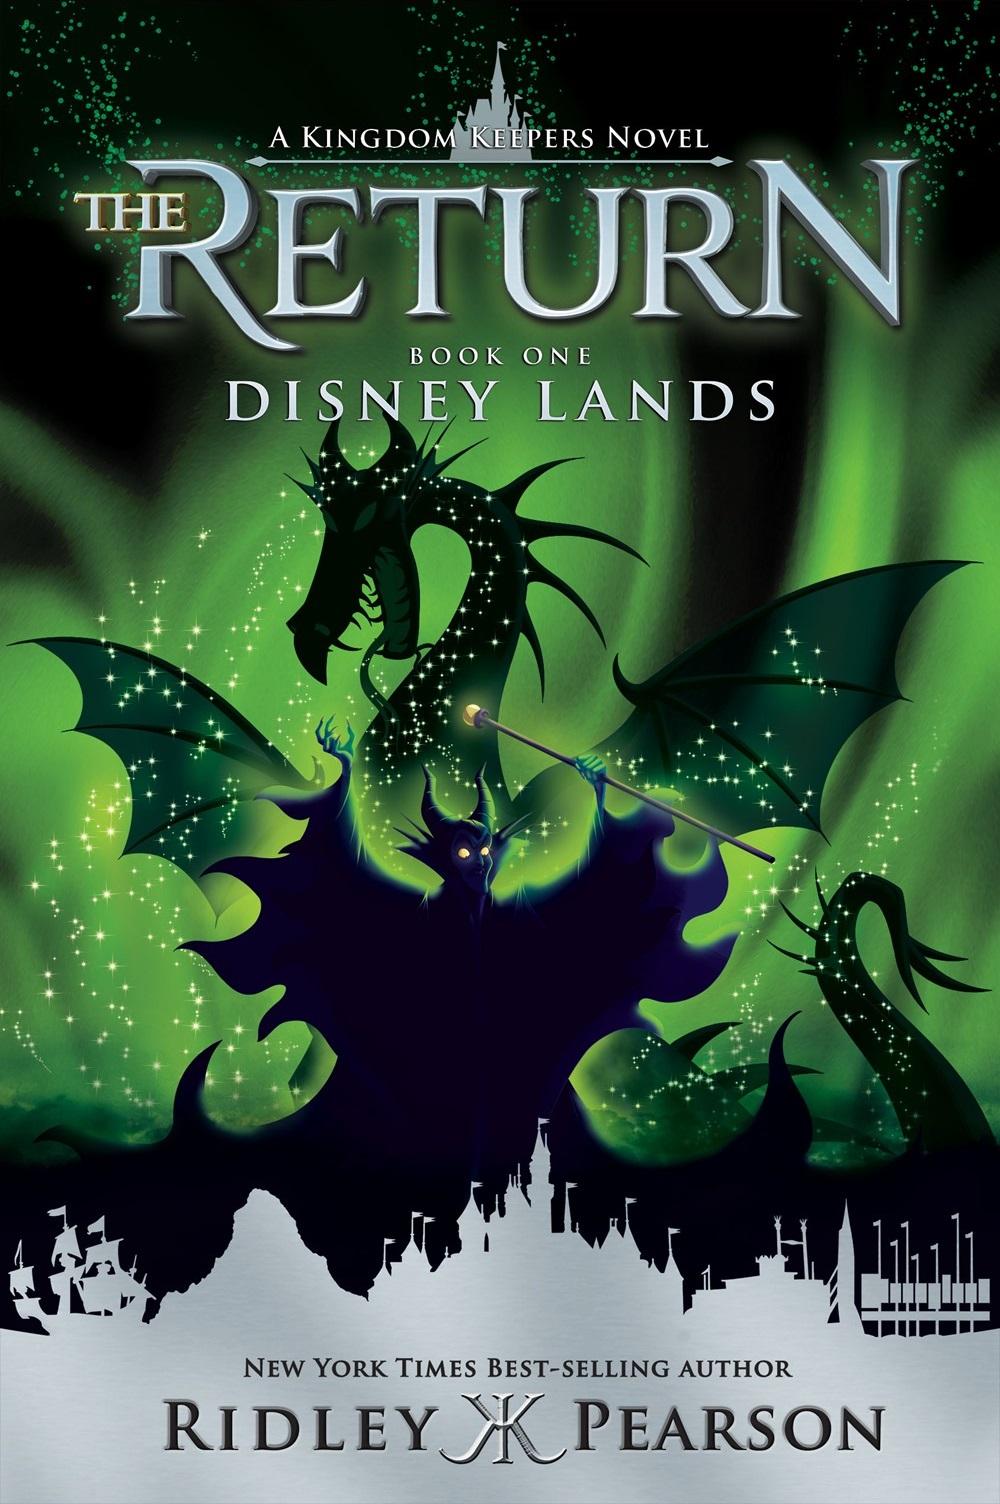 Kingdom Keepers Characters Disney Lands | The Kin...